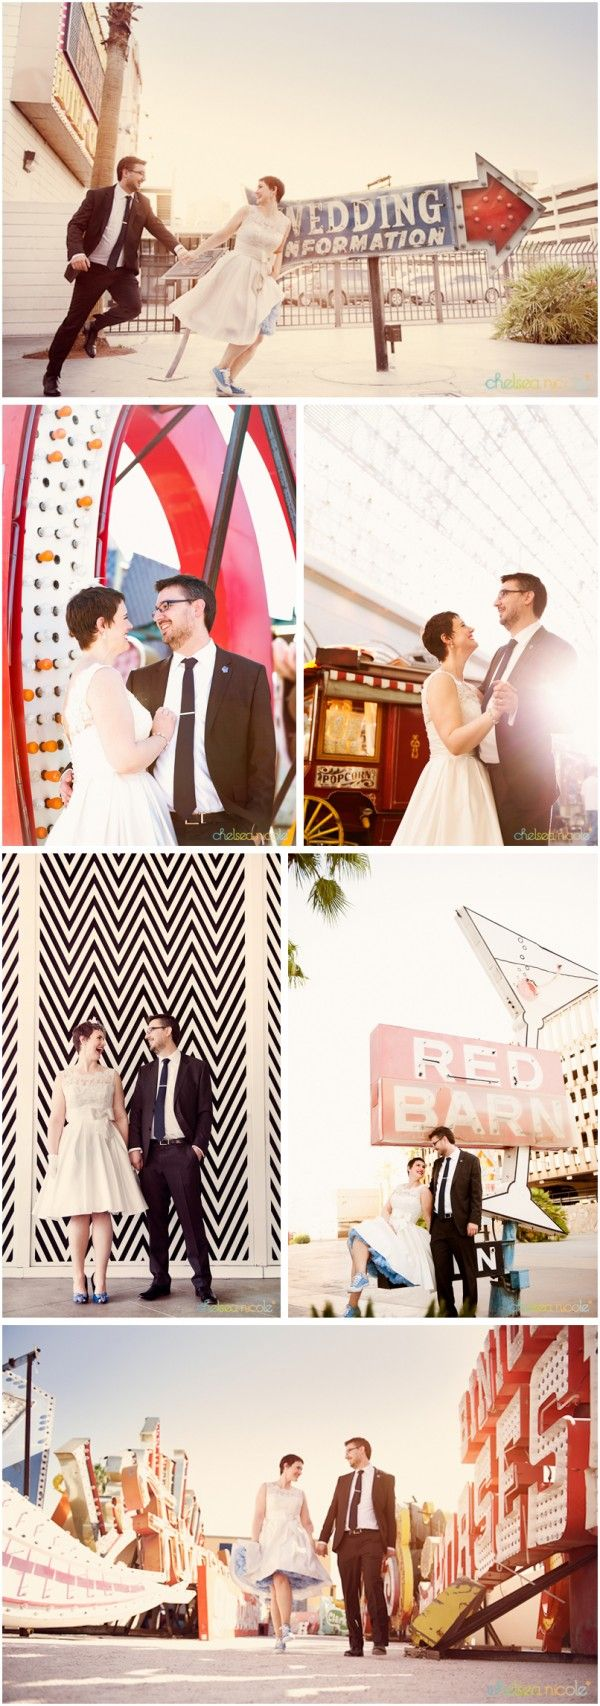 Little Vegas Wedding | Vintage, Retro Style Playful Elopement {Neon Museum} | http://www.littlevegaswedding.com